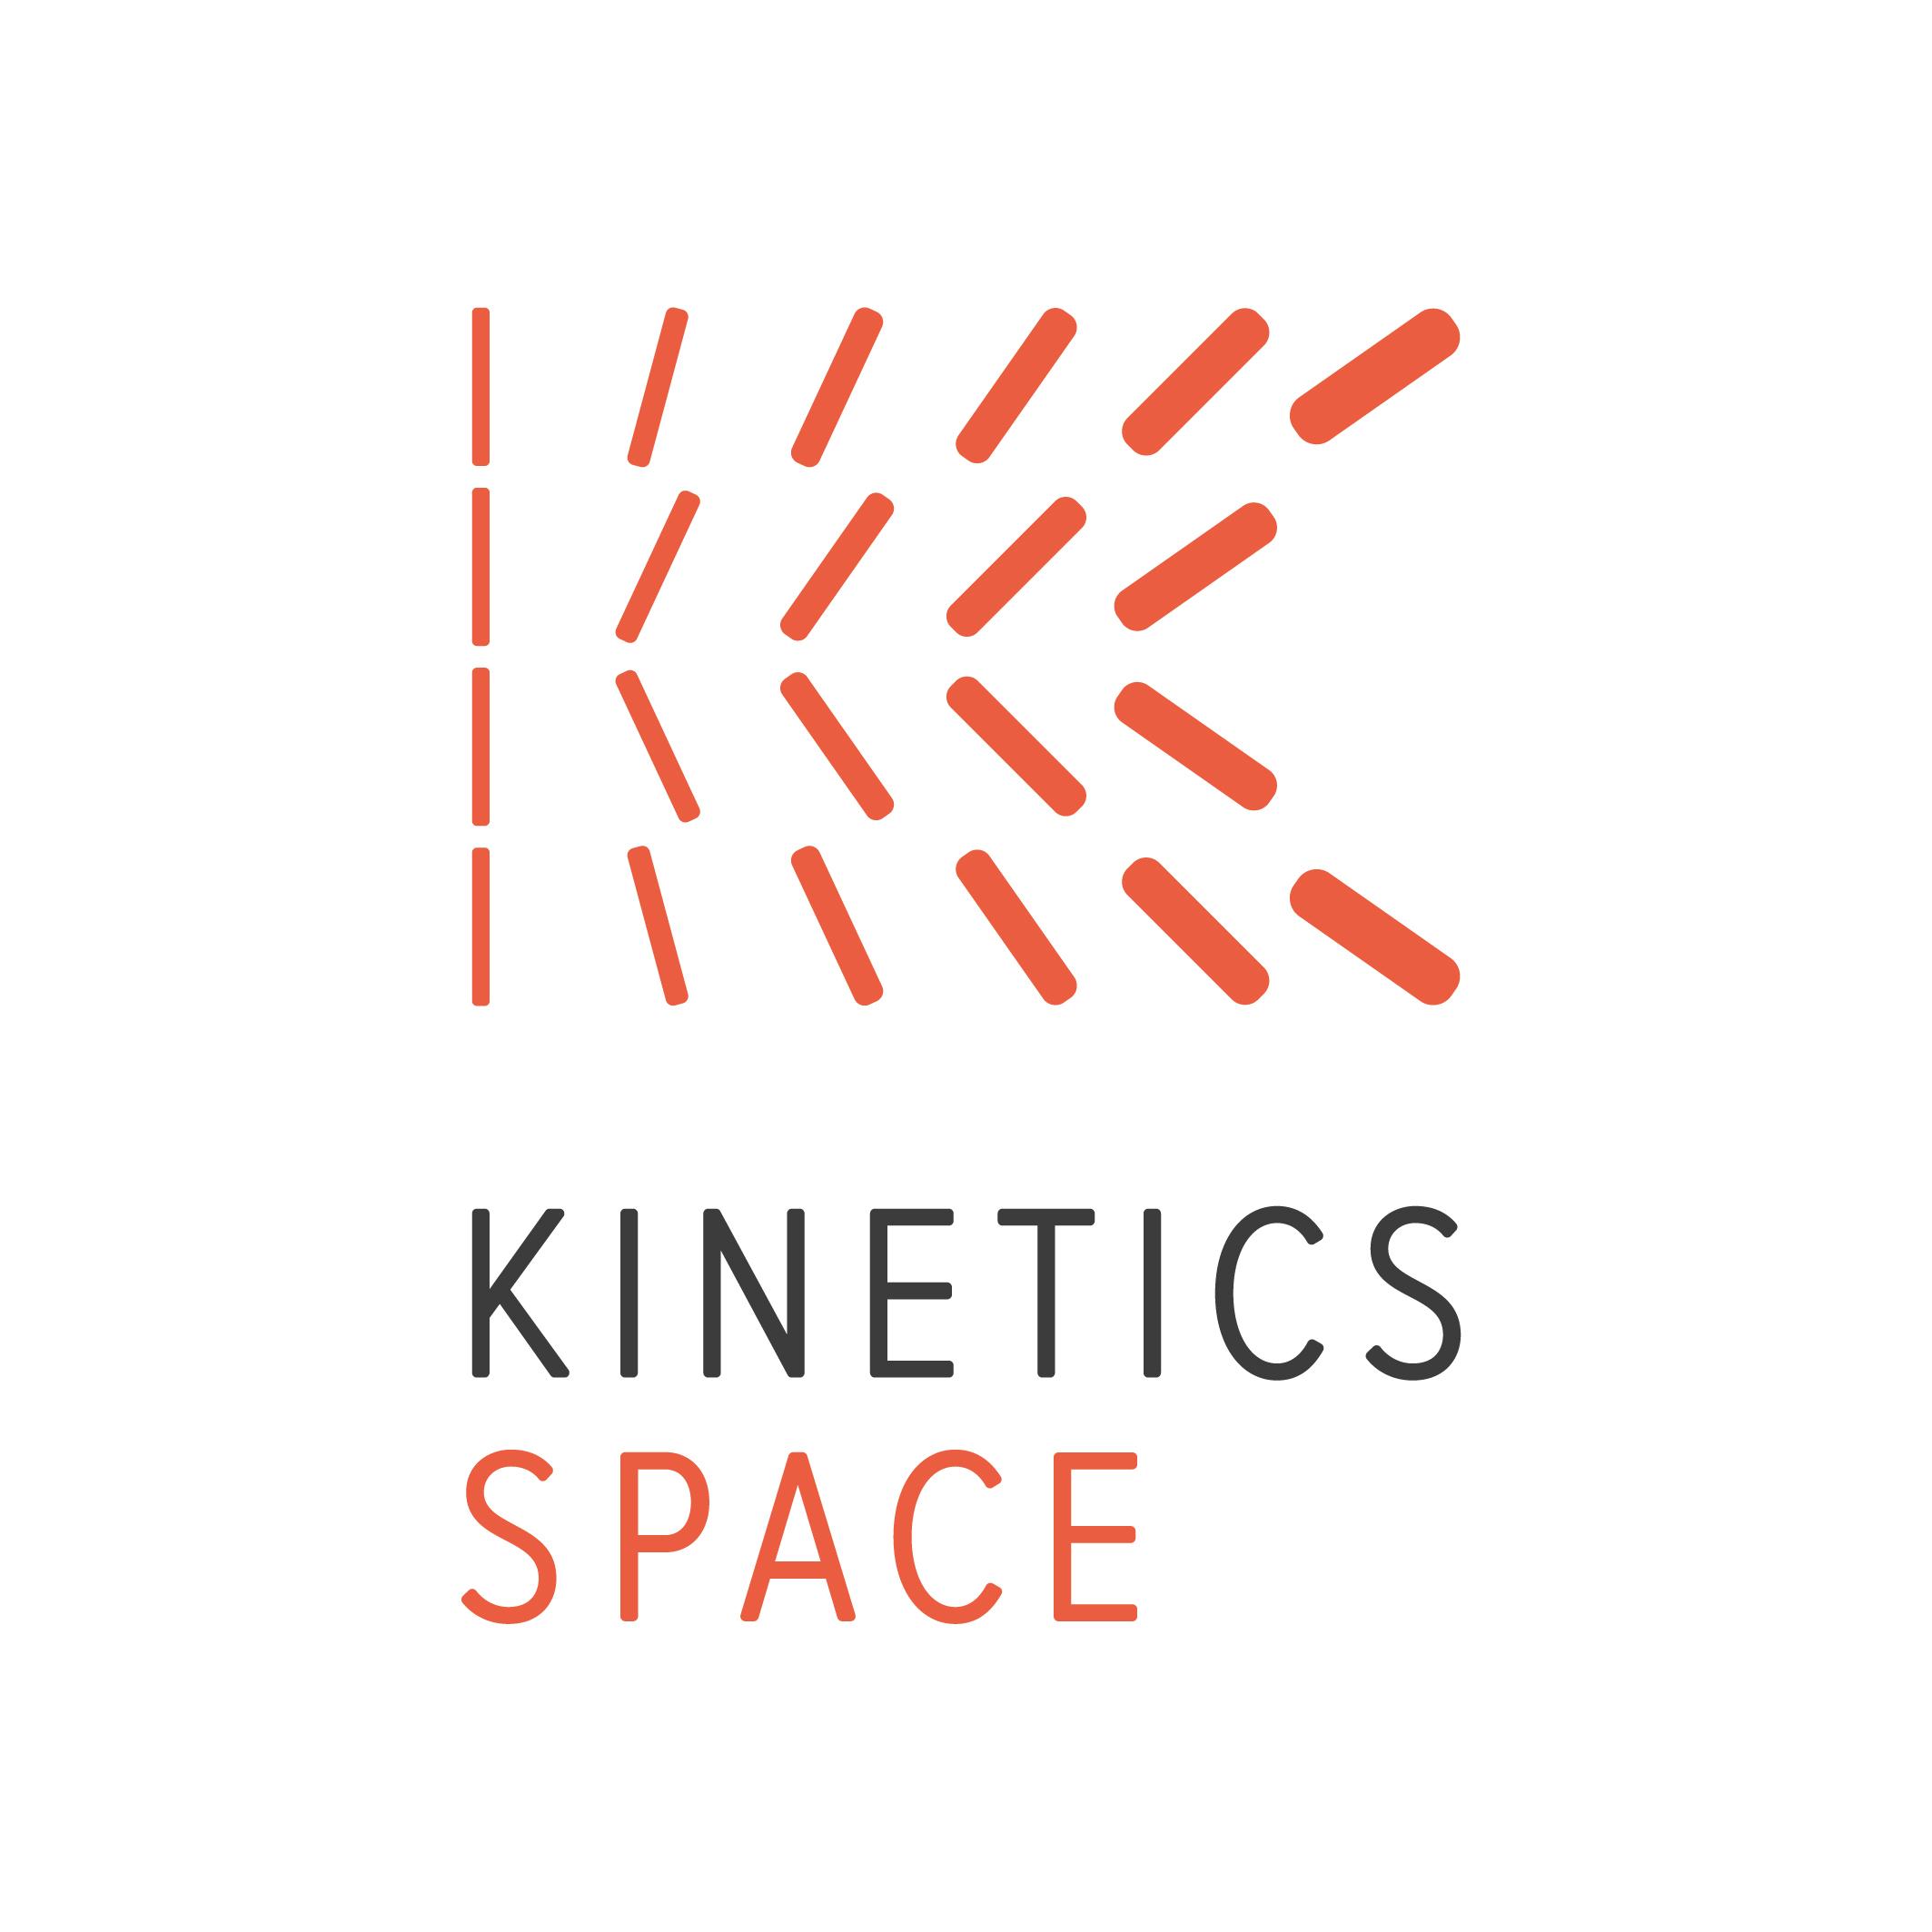 Kinetics Space Portrait RGB jpg